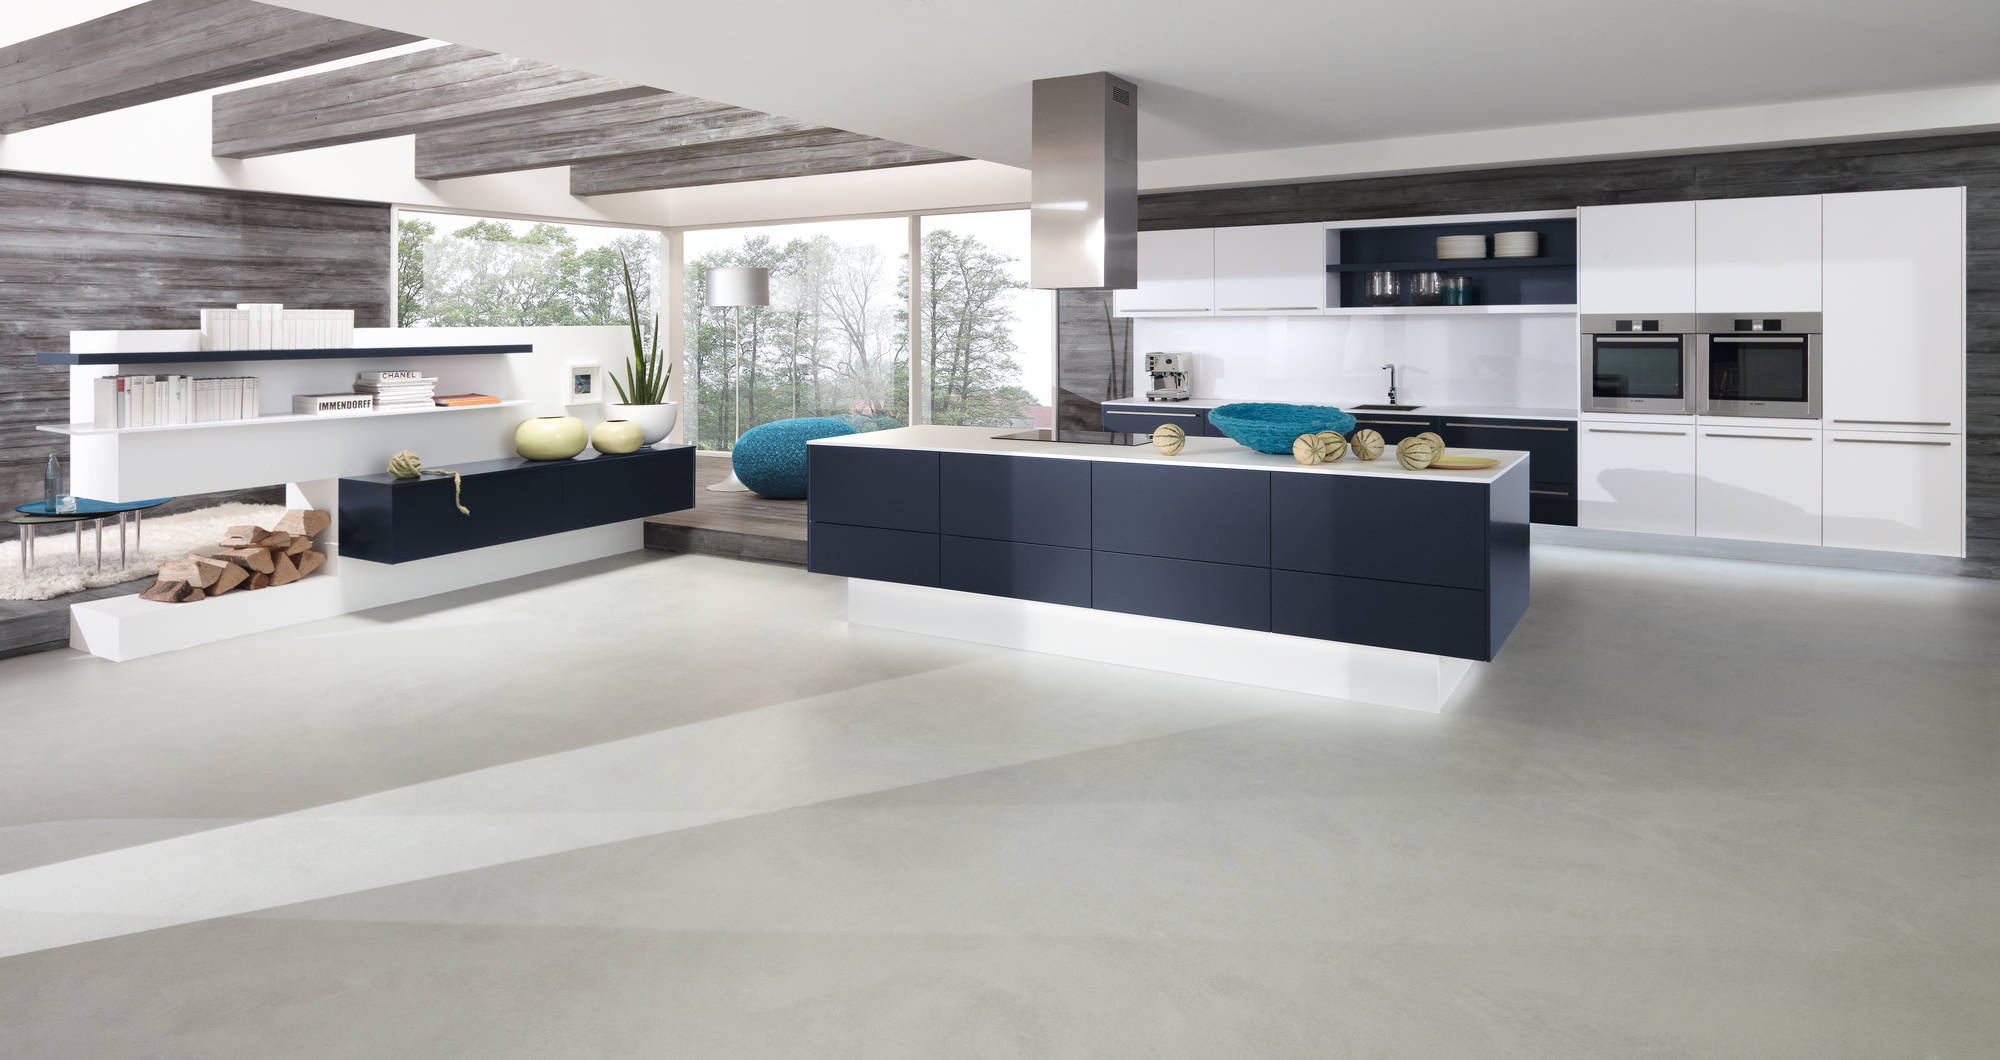 About alno modern kitchens on pinterest modern kitchen cabinets - About Alno Modern Kitchens On Pinterest Modern Kitchen Cabinets 88